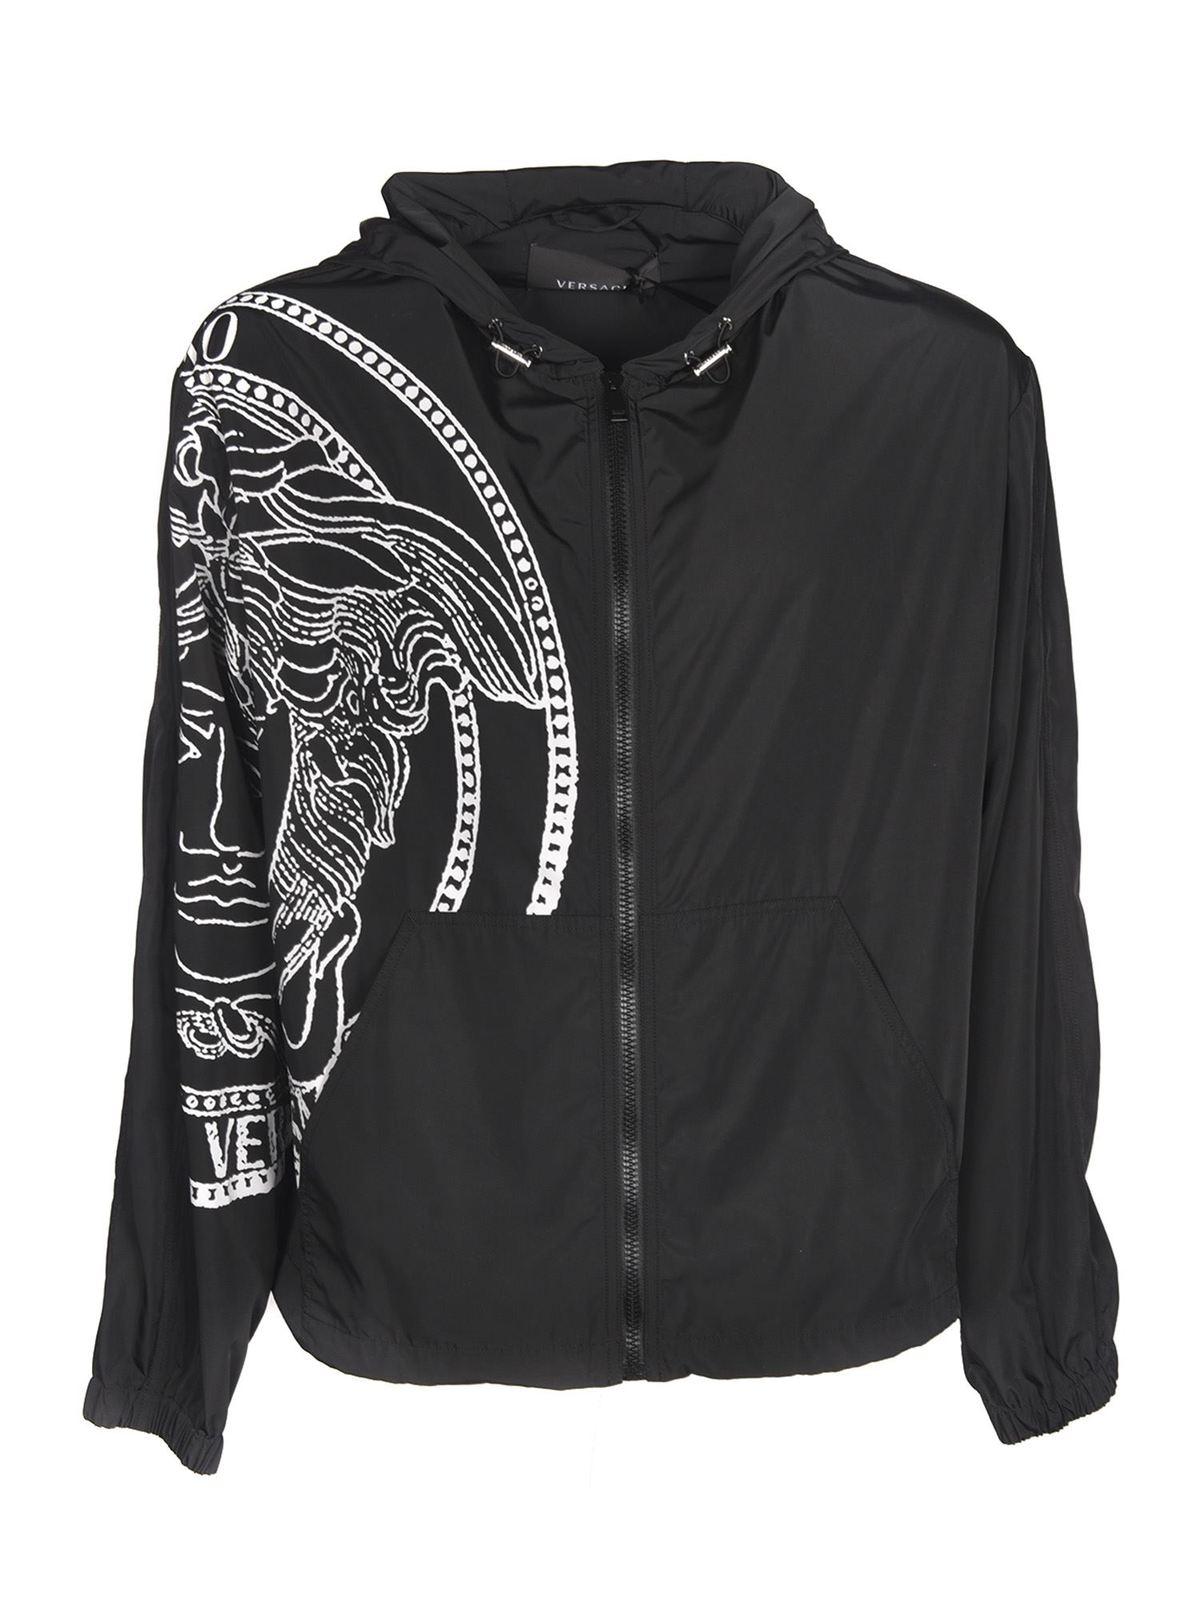 Versace Clothing MEDUSA JACKET IN BLACK